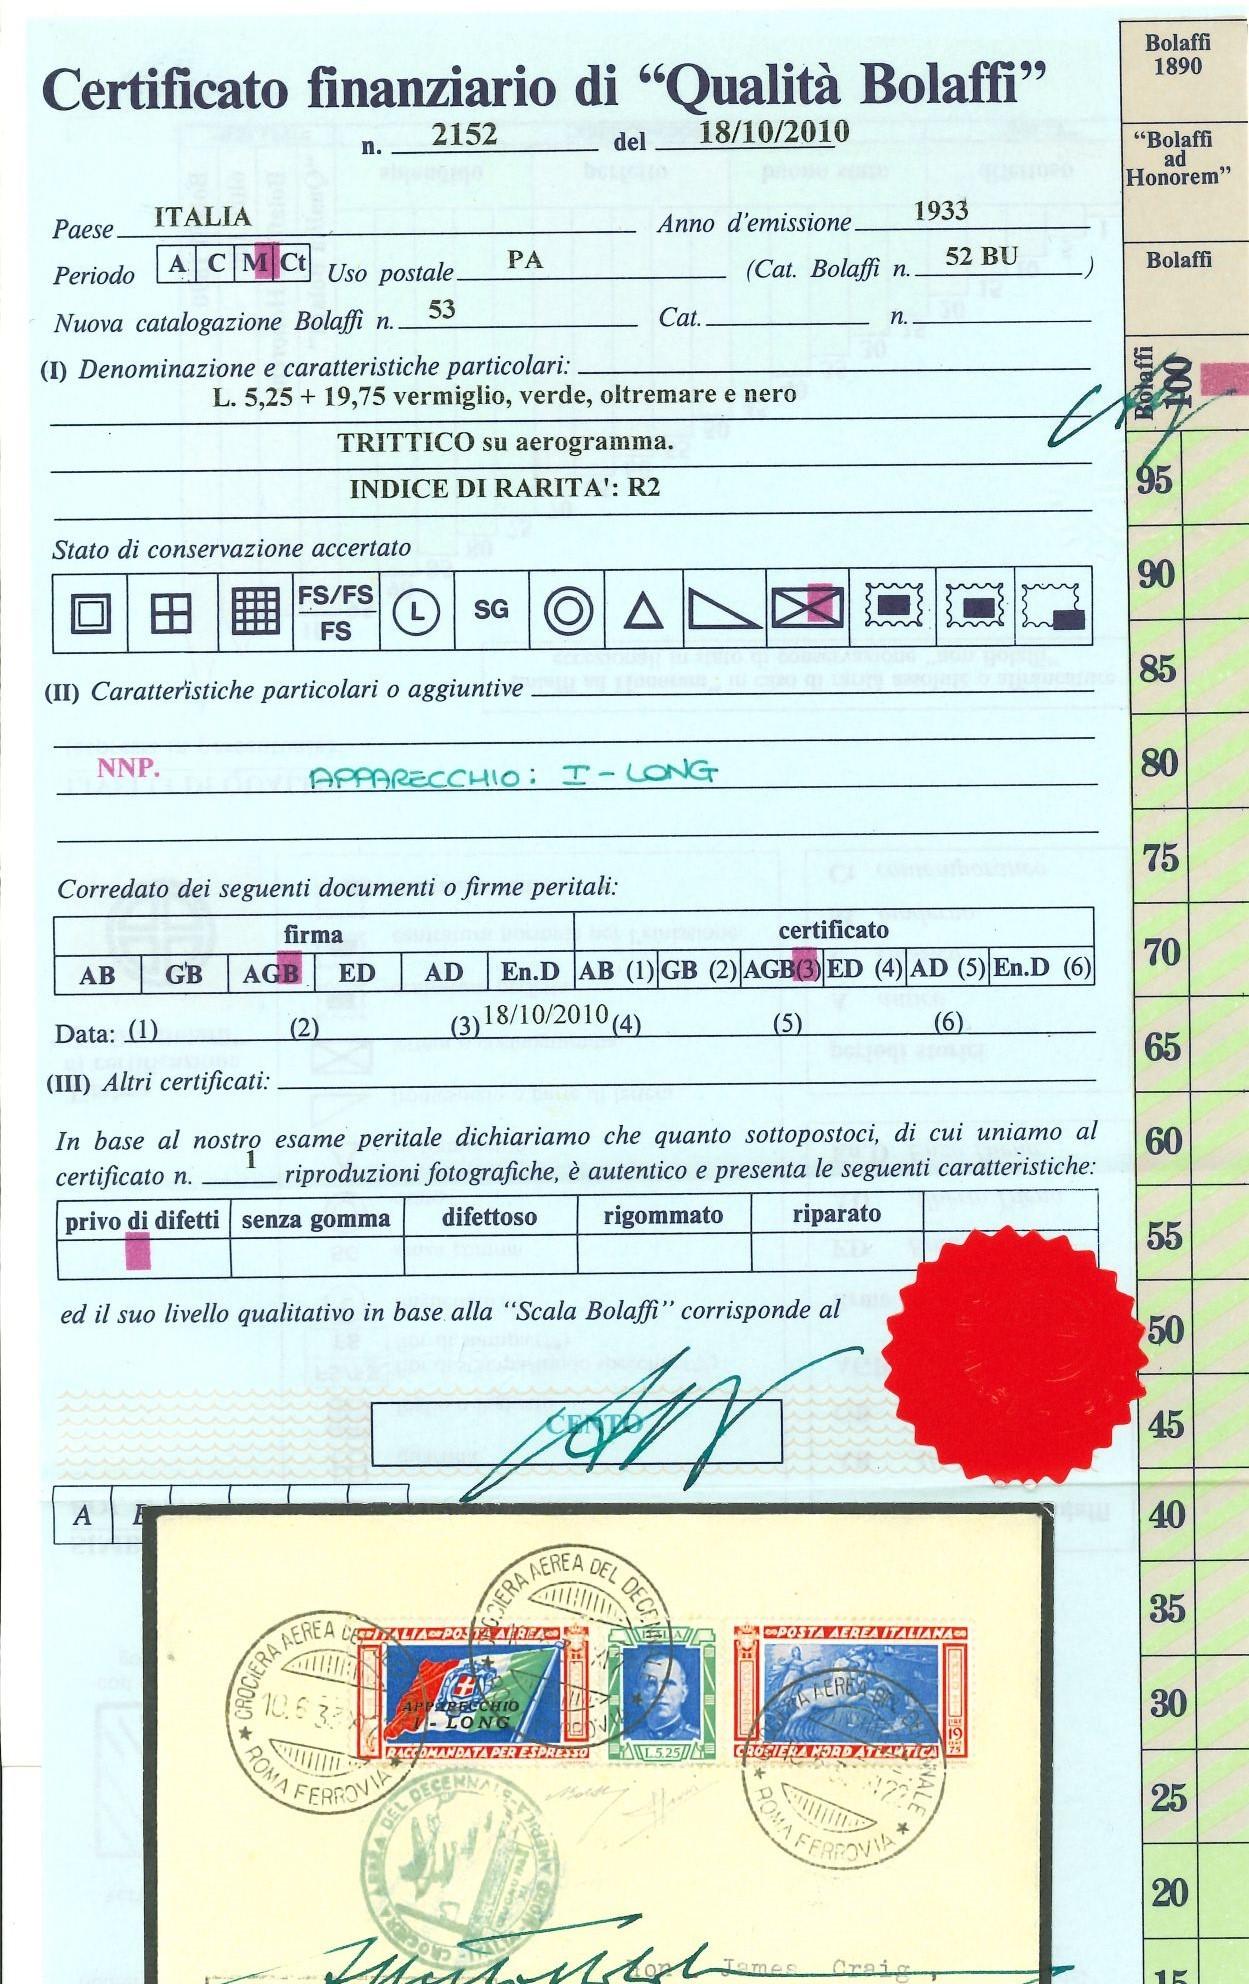 Lot 2428 - REGNO D'ITALIA Individual lots -  Ponte Auction House Stamps Auction 505